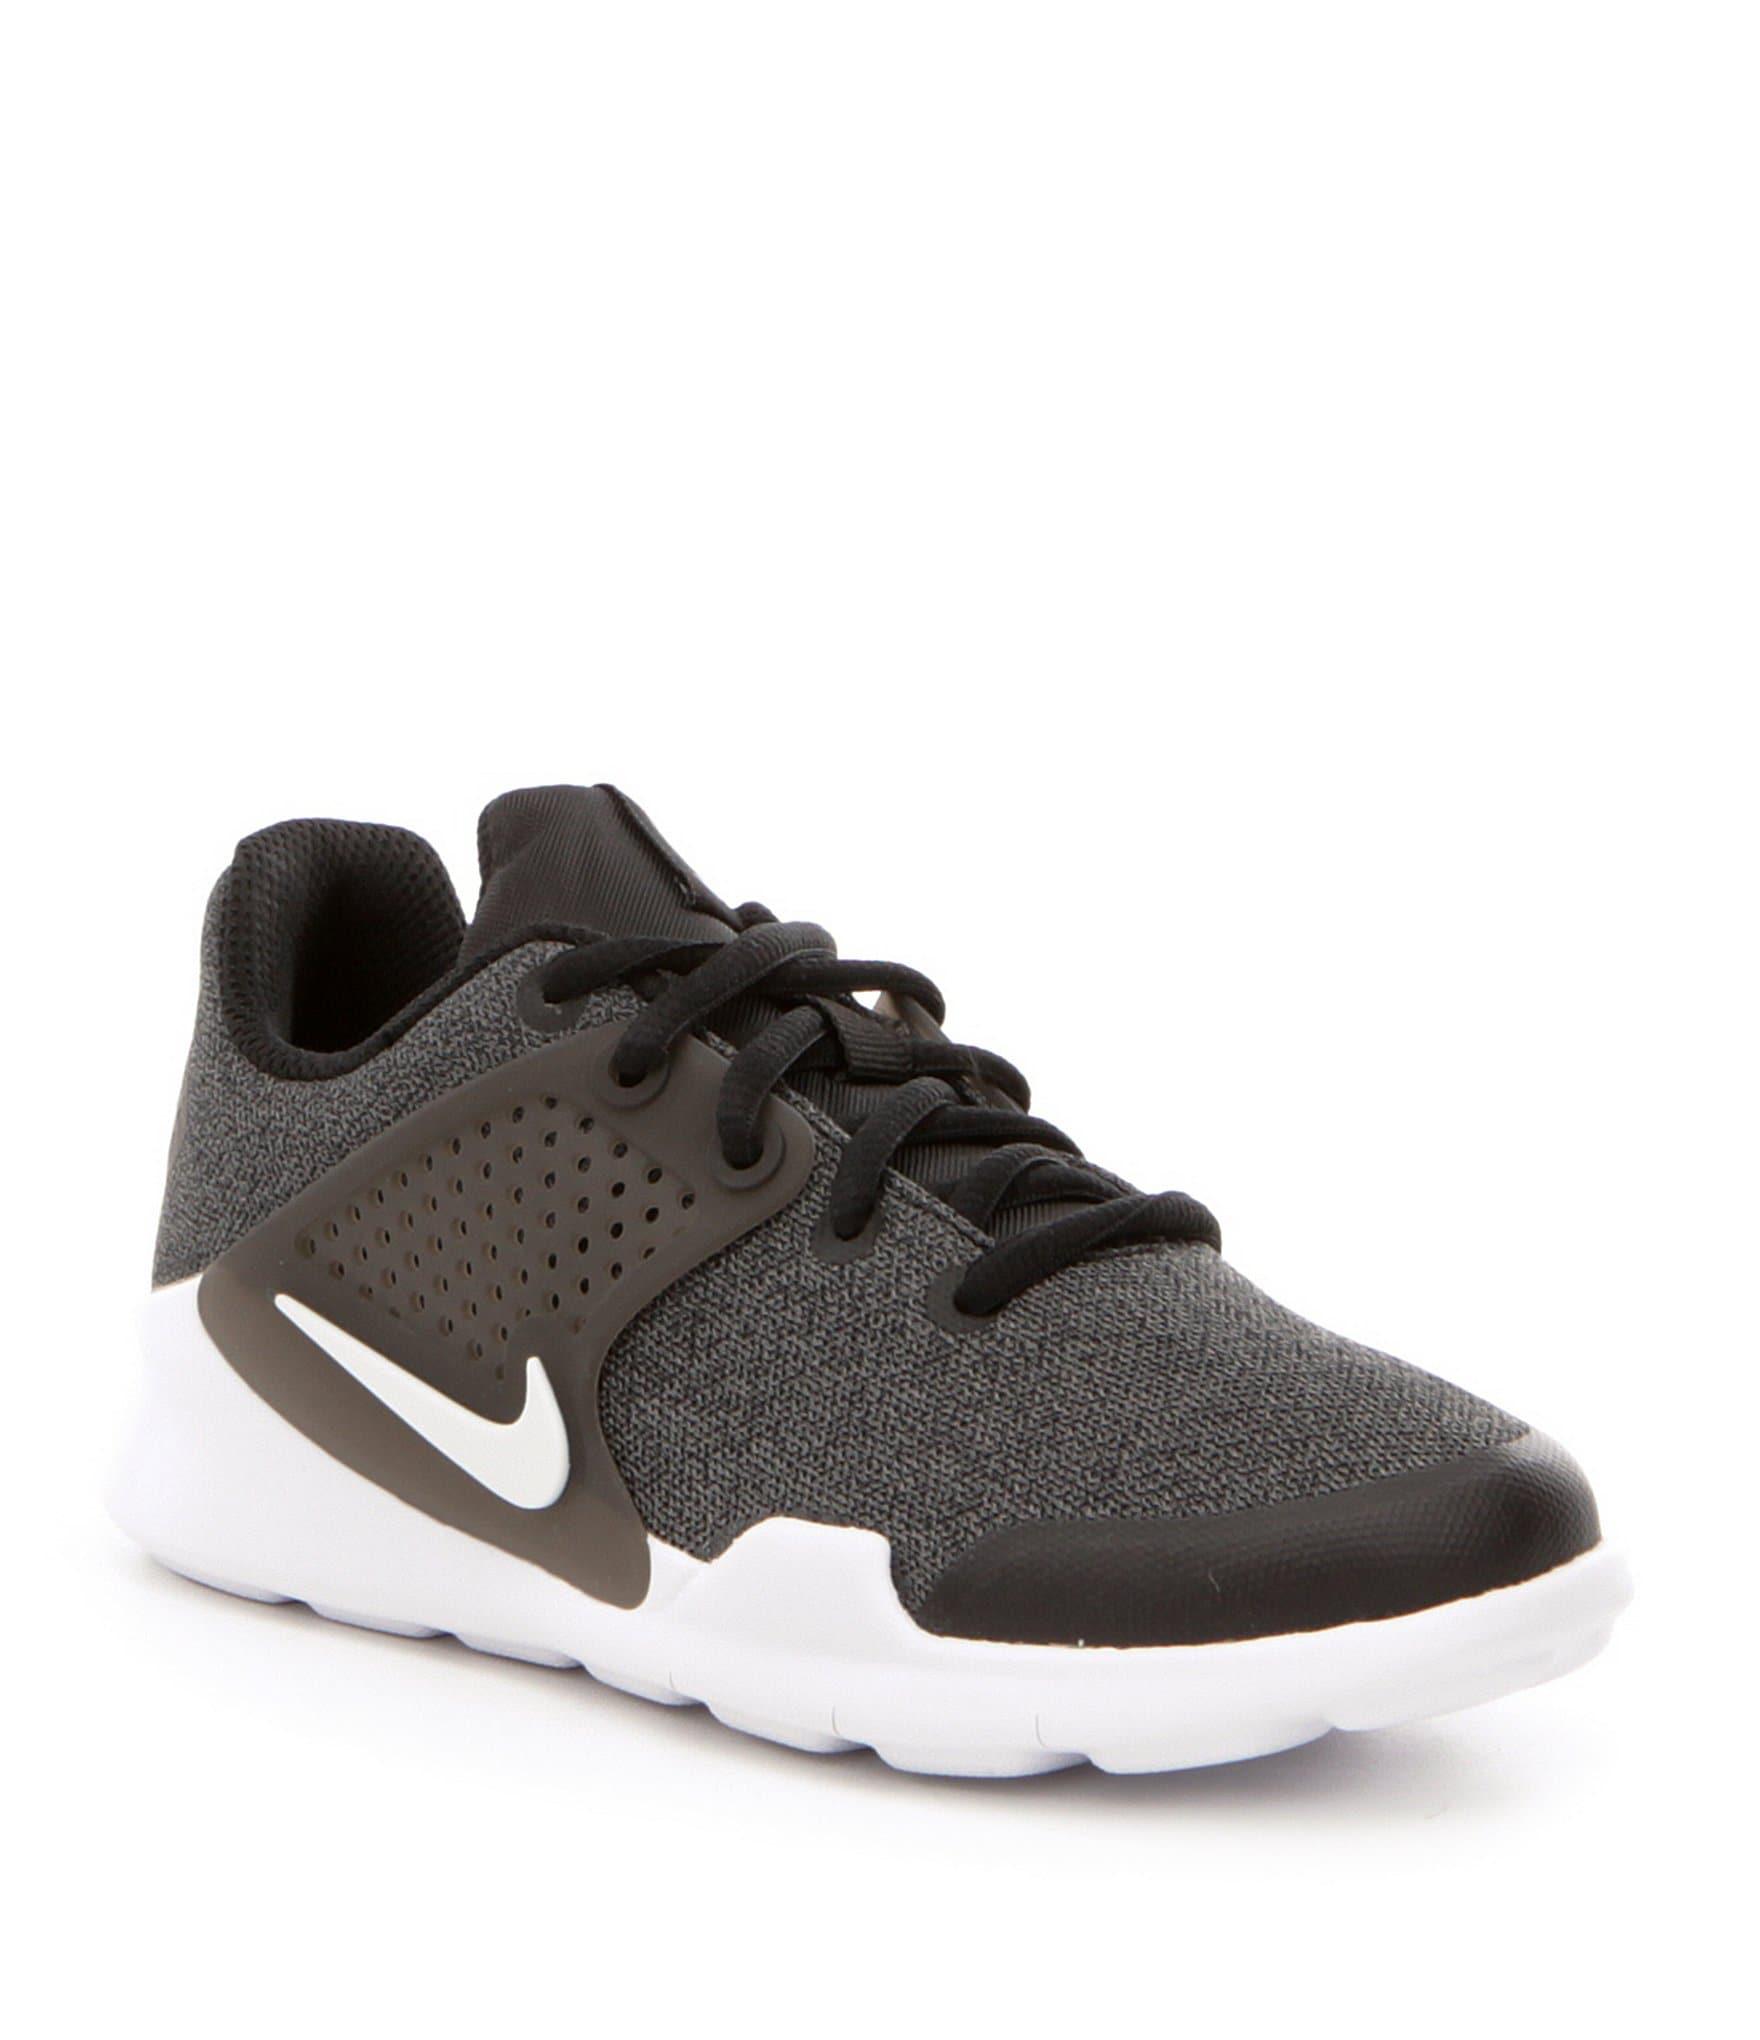 Nike Boys Arrowz Lifestyle Shoe Dillards